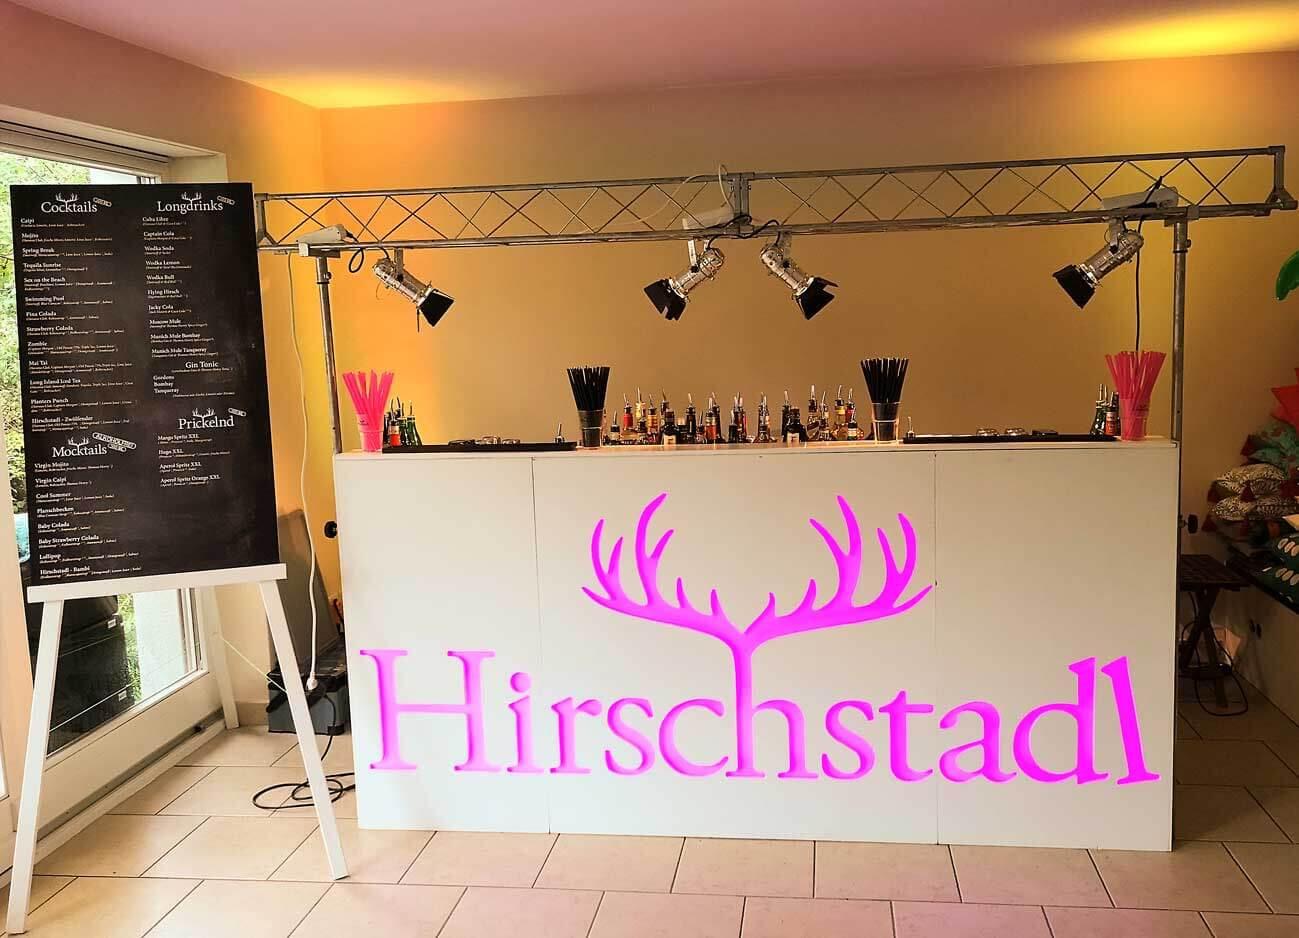 mobiles Cocktail Catering in München mieten mit mobilen Barkeepern